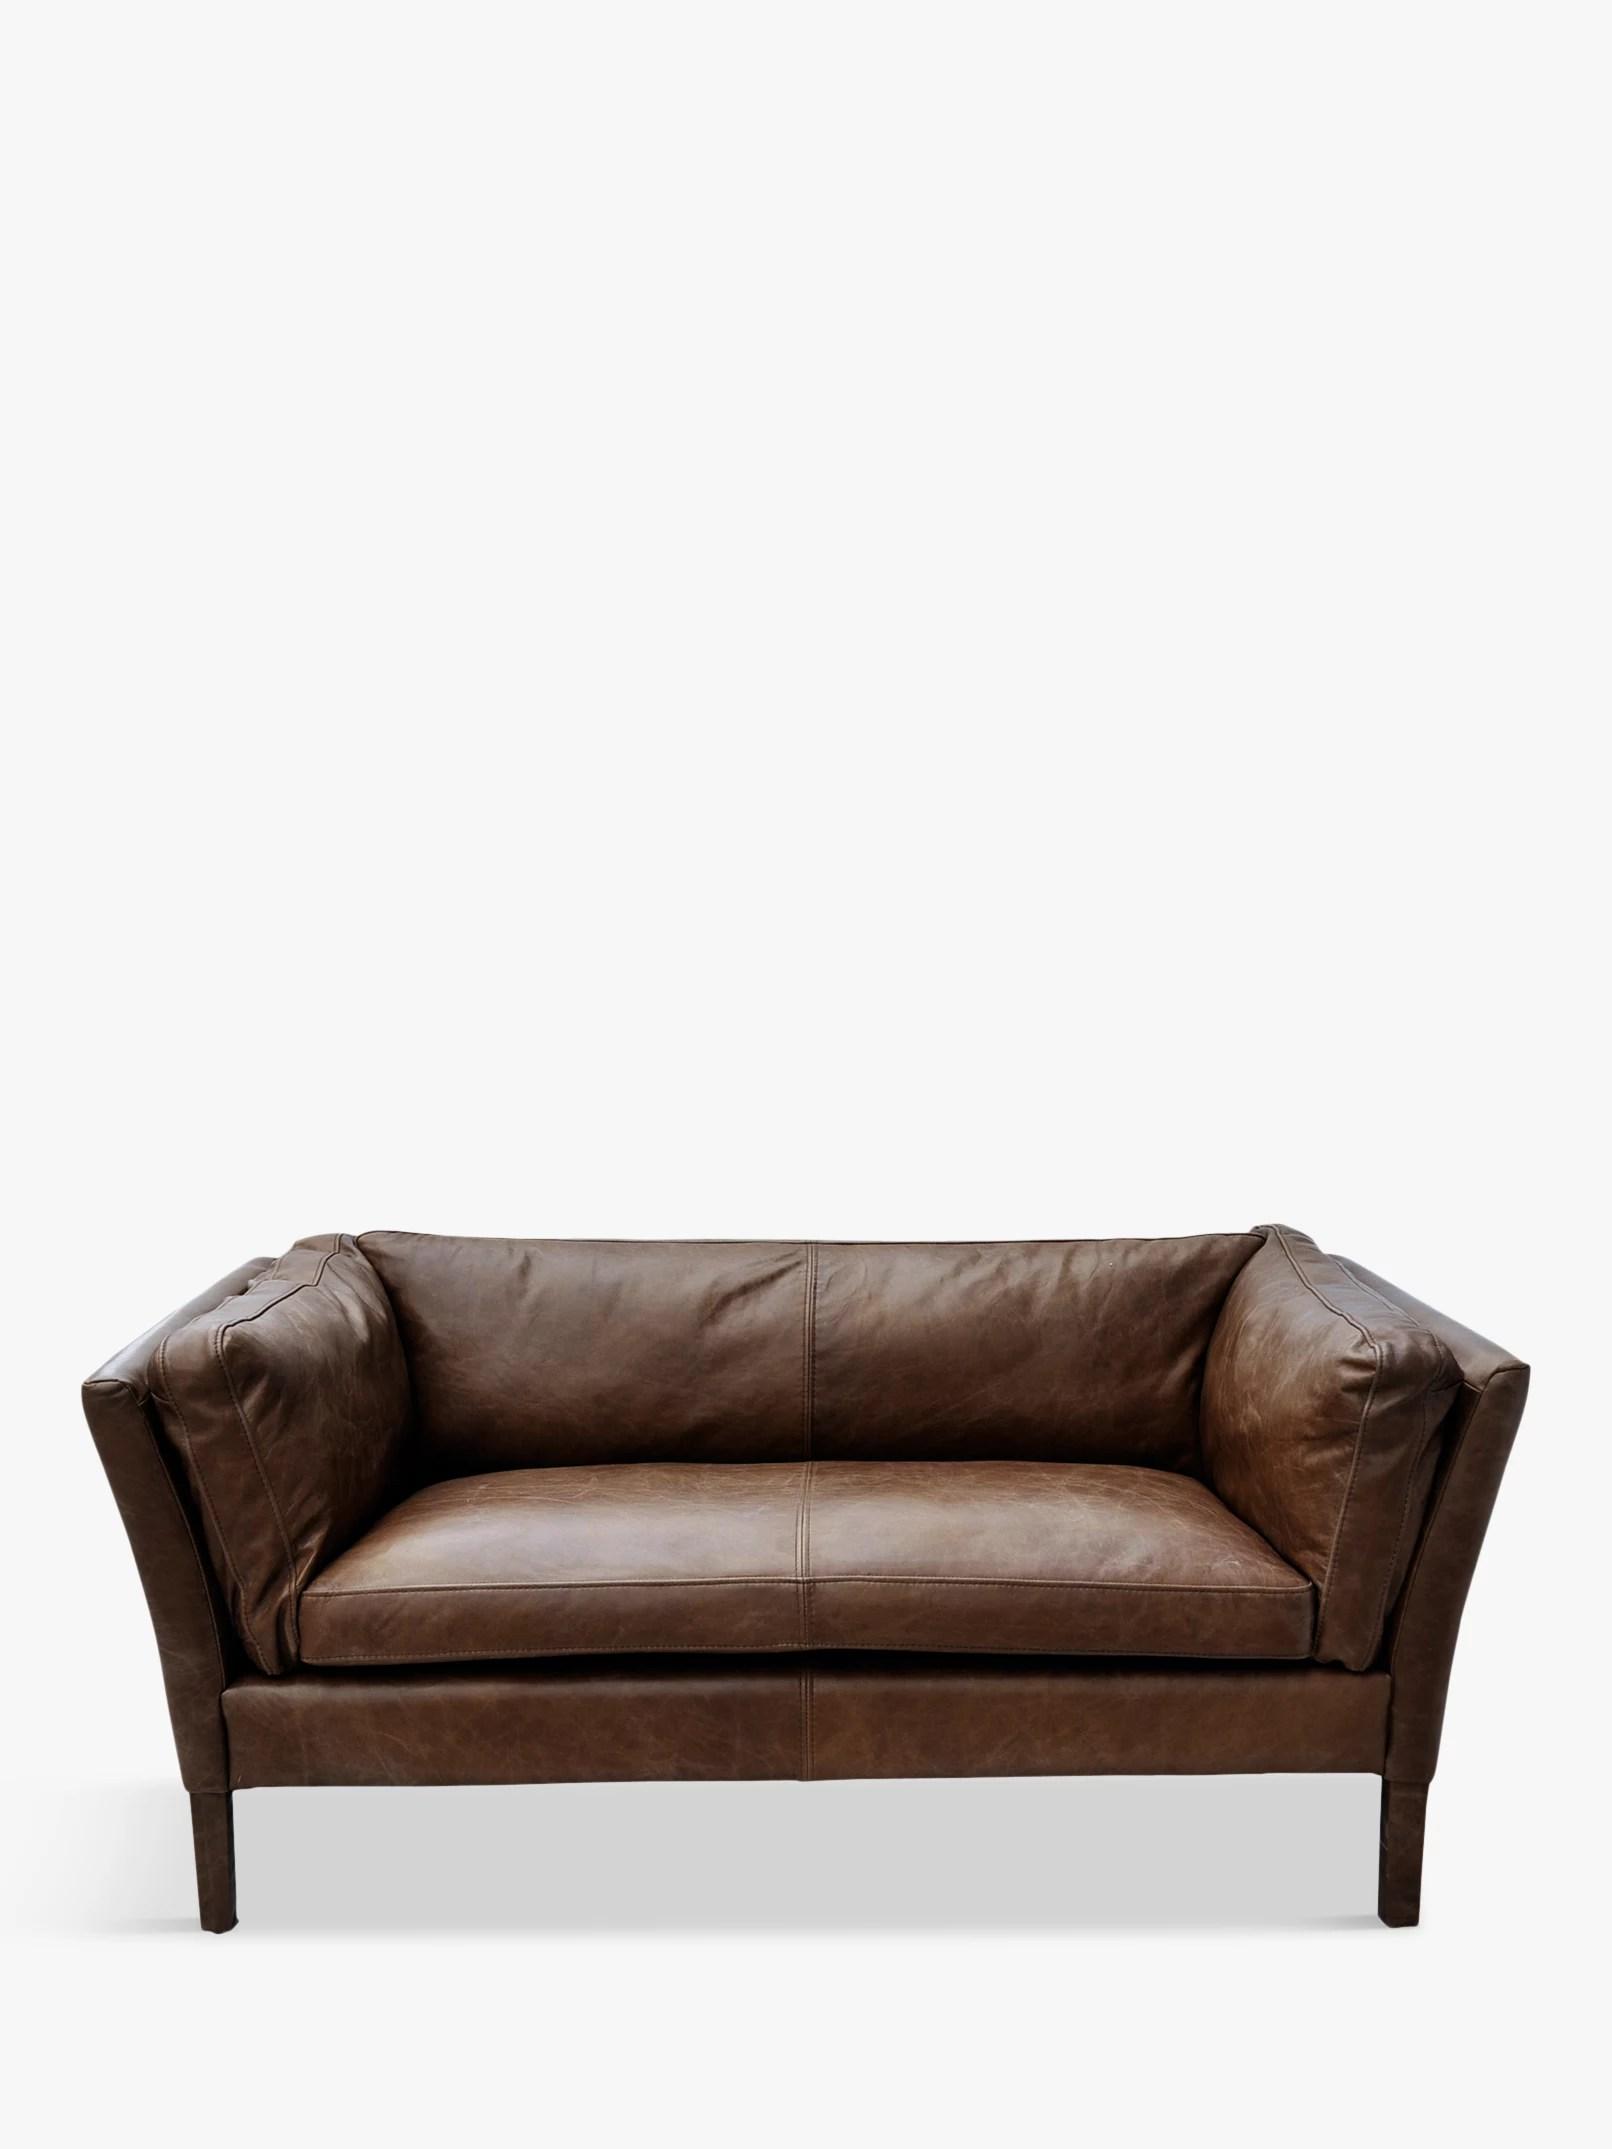 Ashley Furniture Kitchener Leather Sofa From Germany Oak Bedroom Furniture Uk